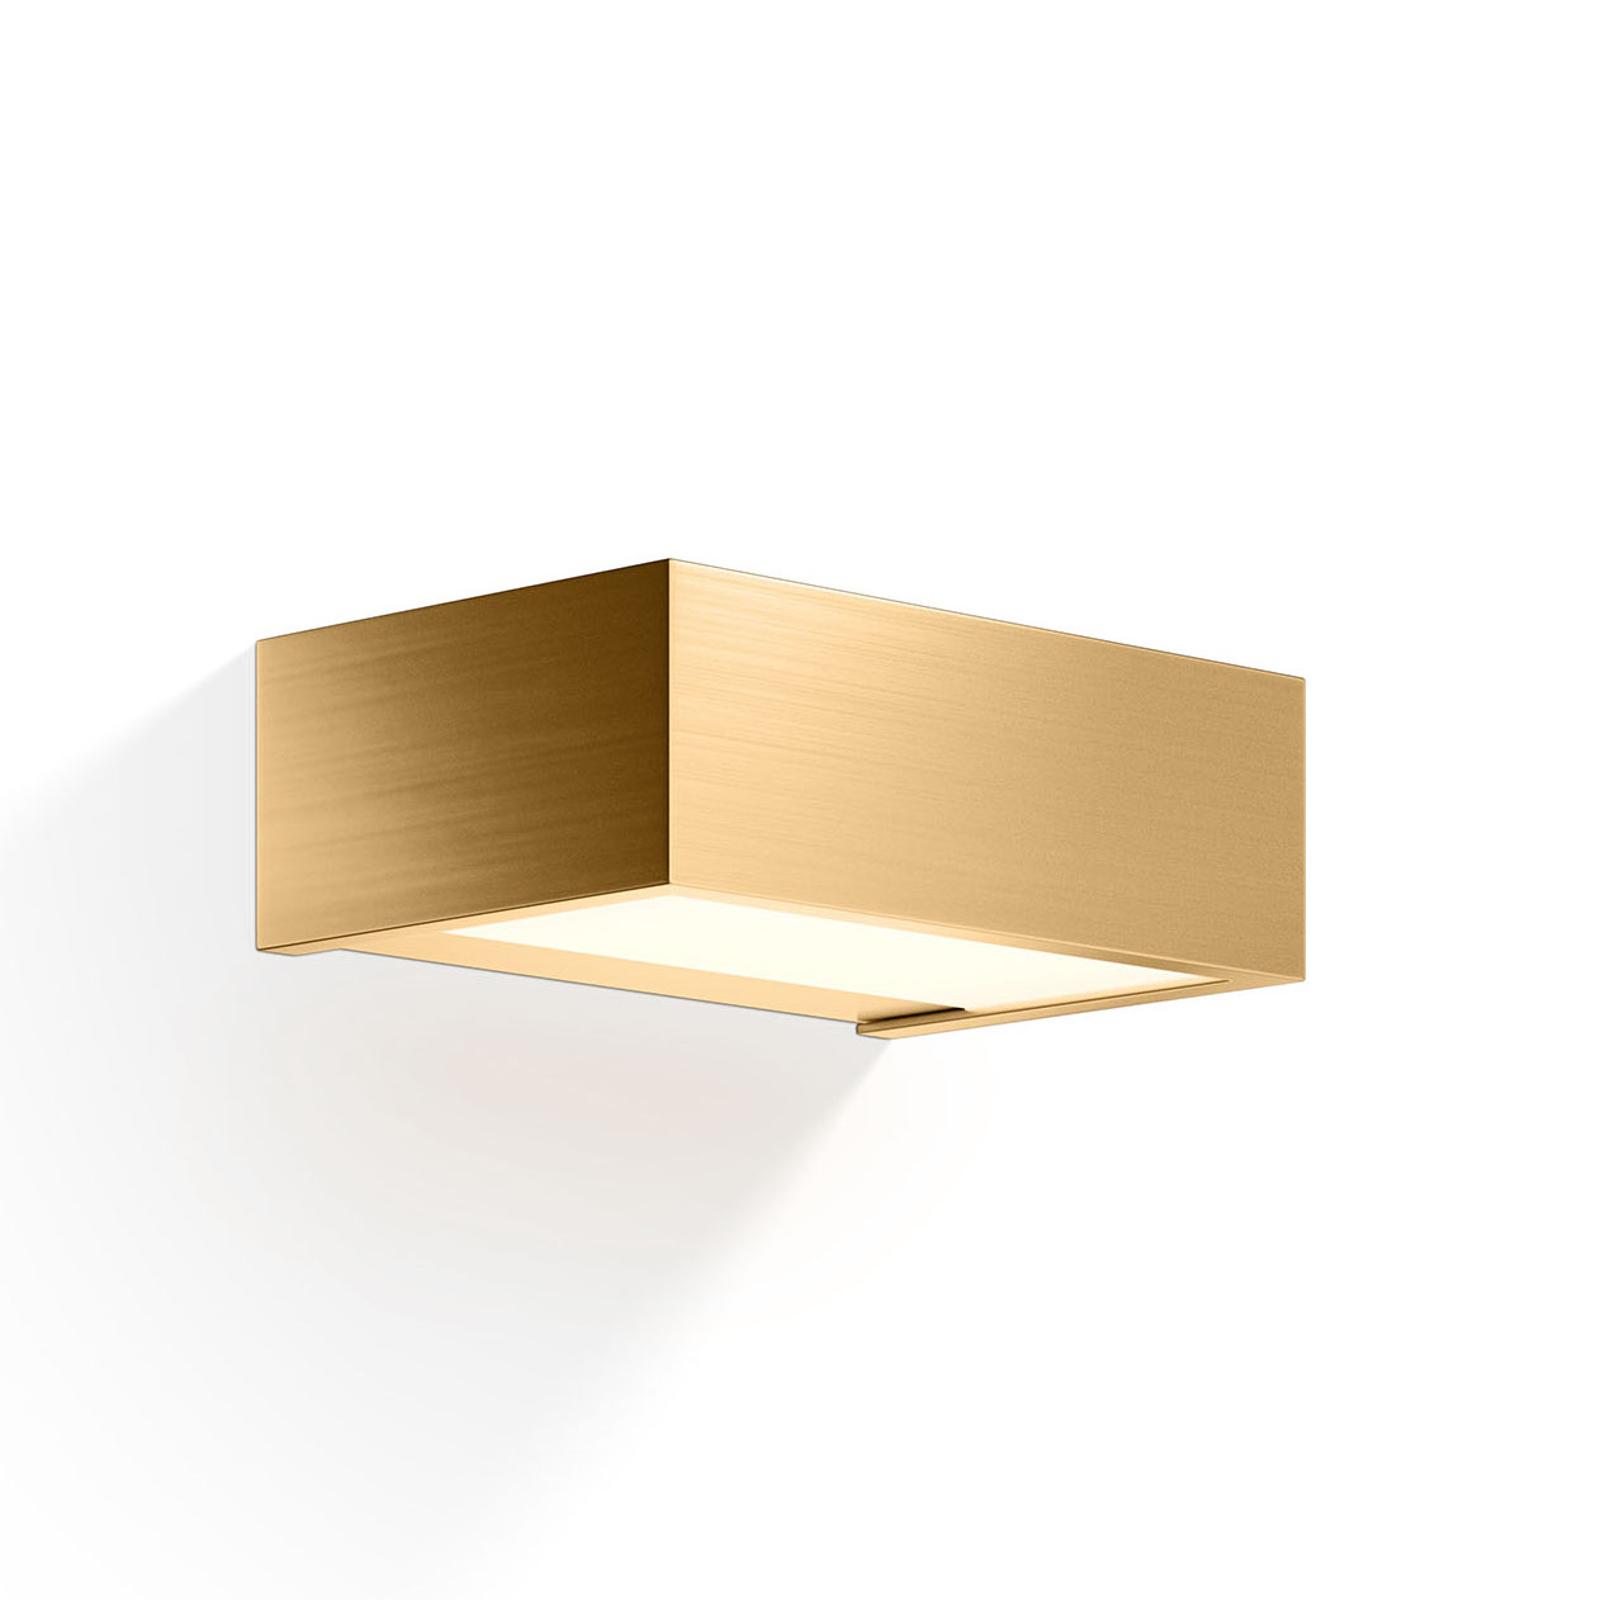 Decor Walther Box LED-vägglampa guld 2700K 15 cm